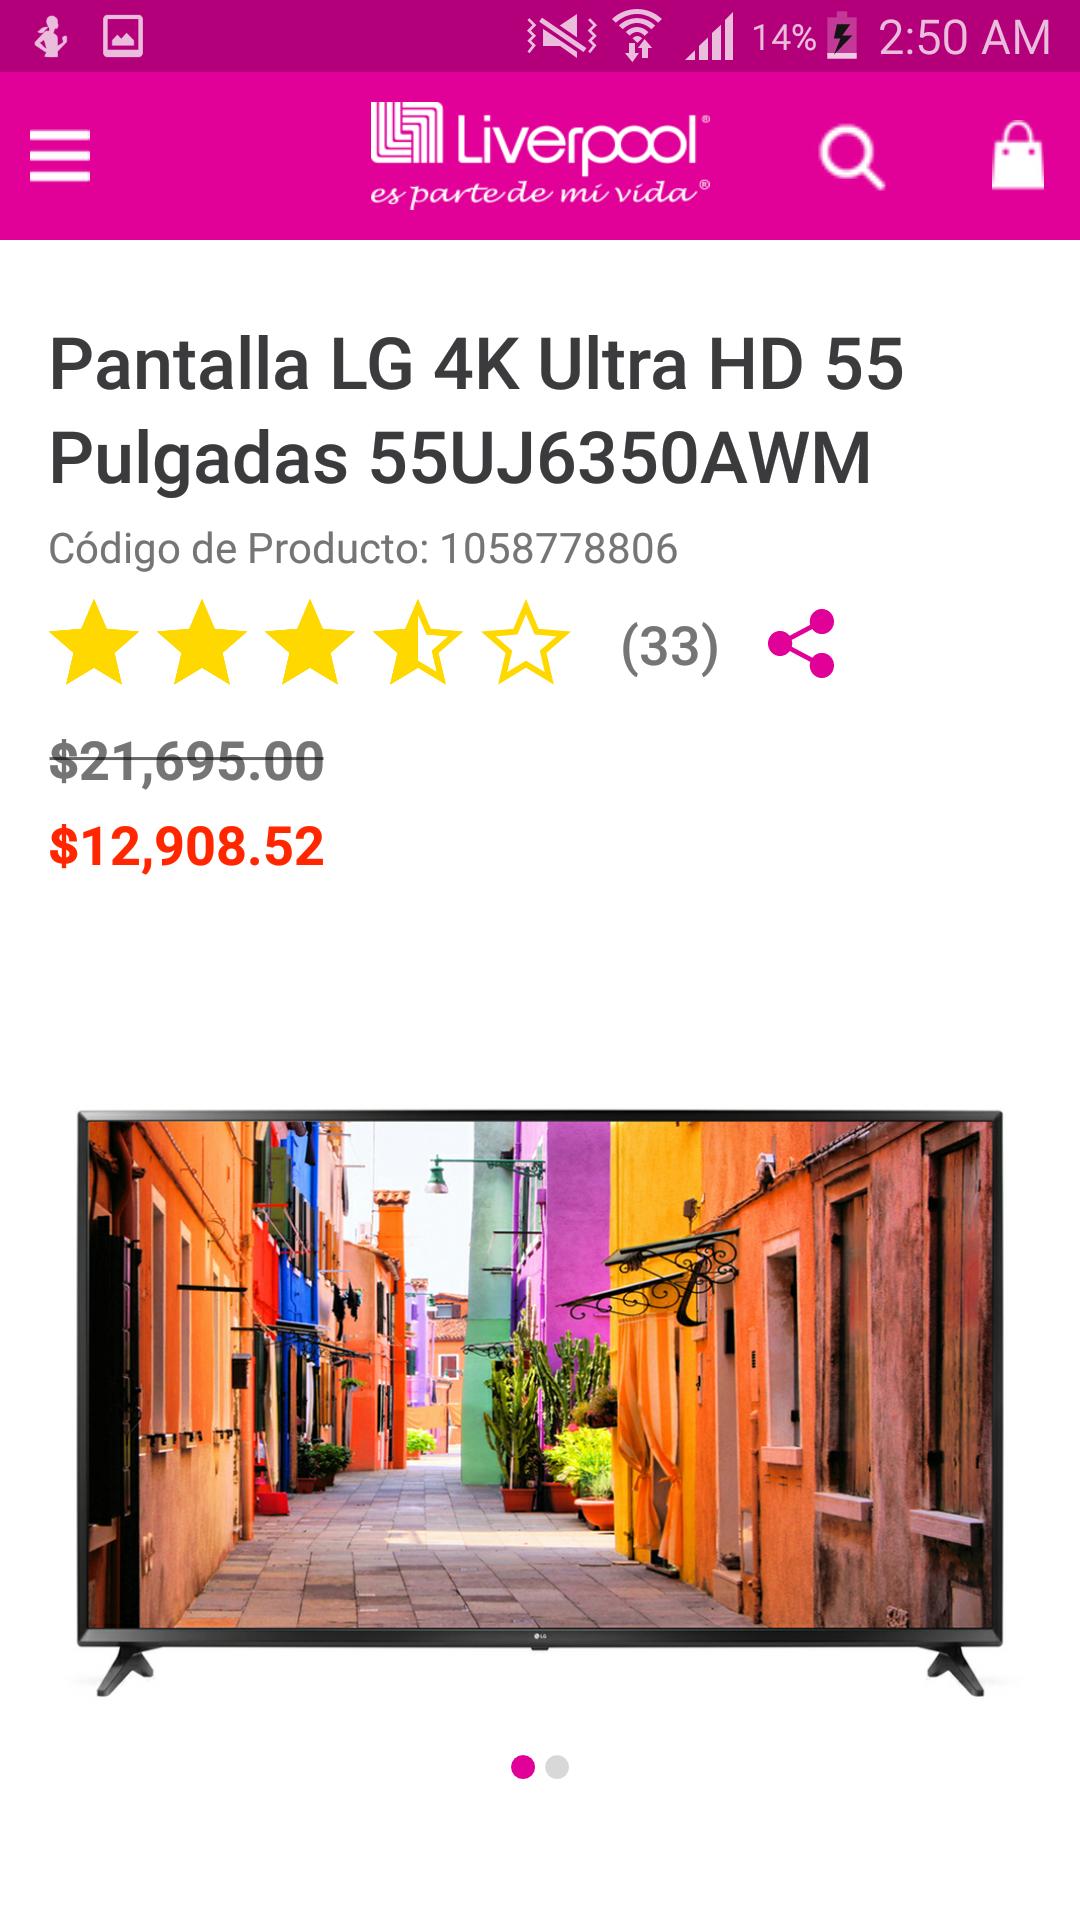 Liverpool:Pantalla LG 4K Ultra HD 55 Pulgadas 55UJ6350AWM